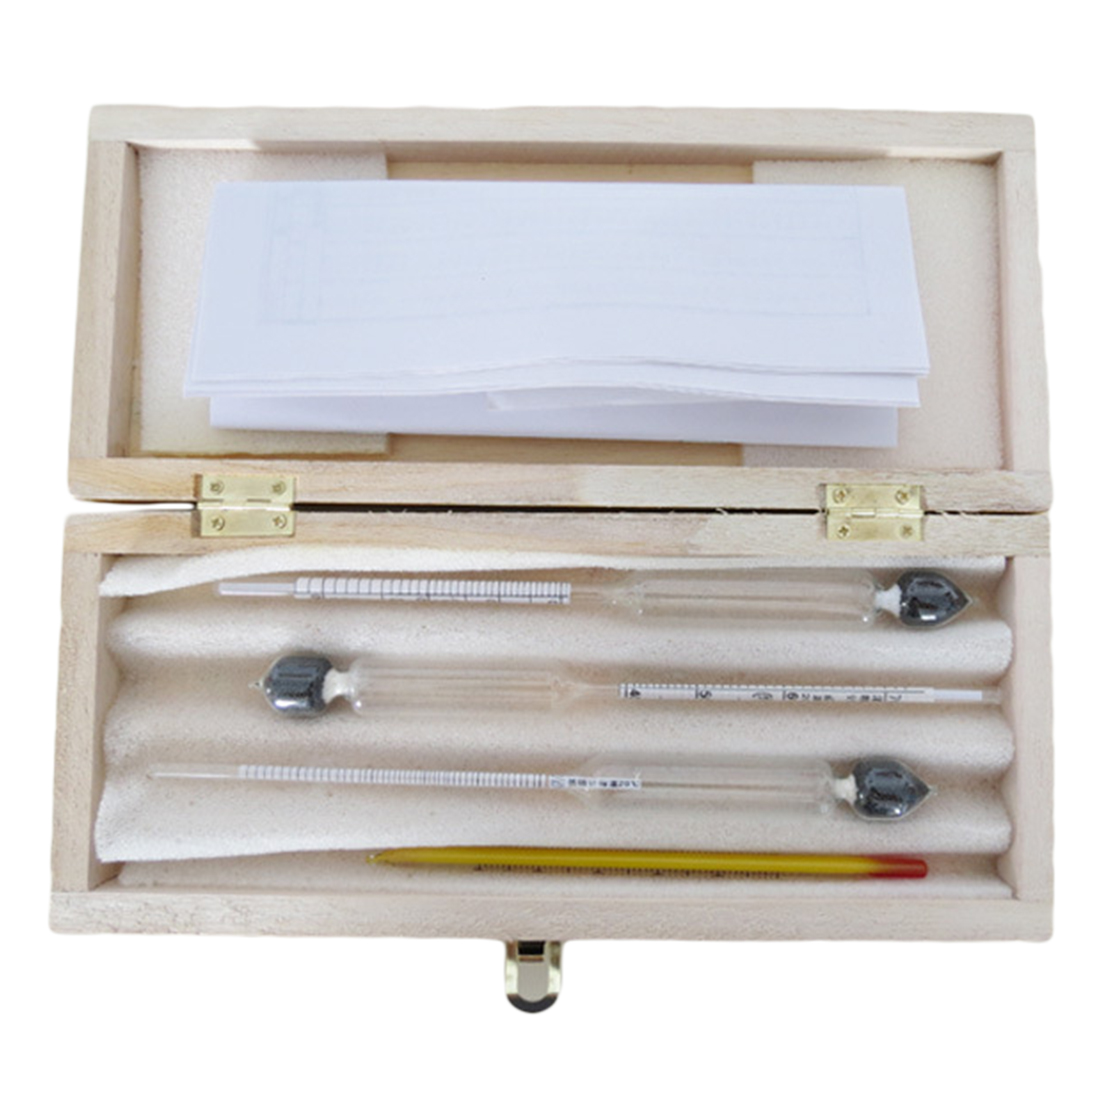 3 teile/satz Alcoholmeter Alkohol Meter wein Konzentrationsmesser Alkohol Instrument Hydrometer Tester